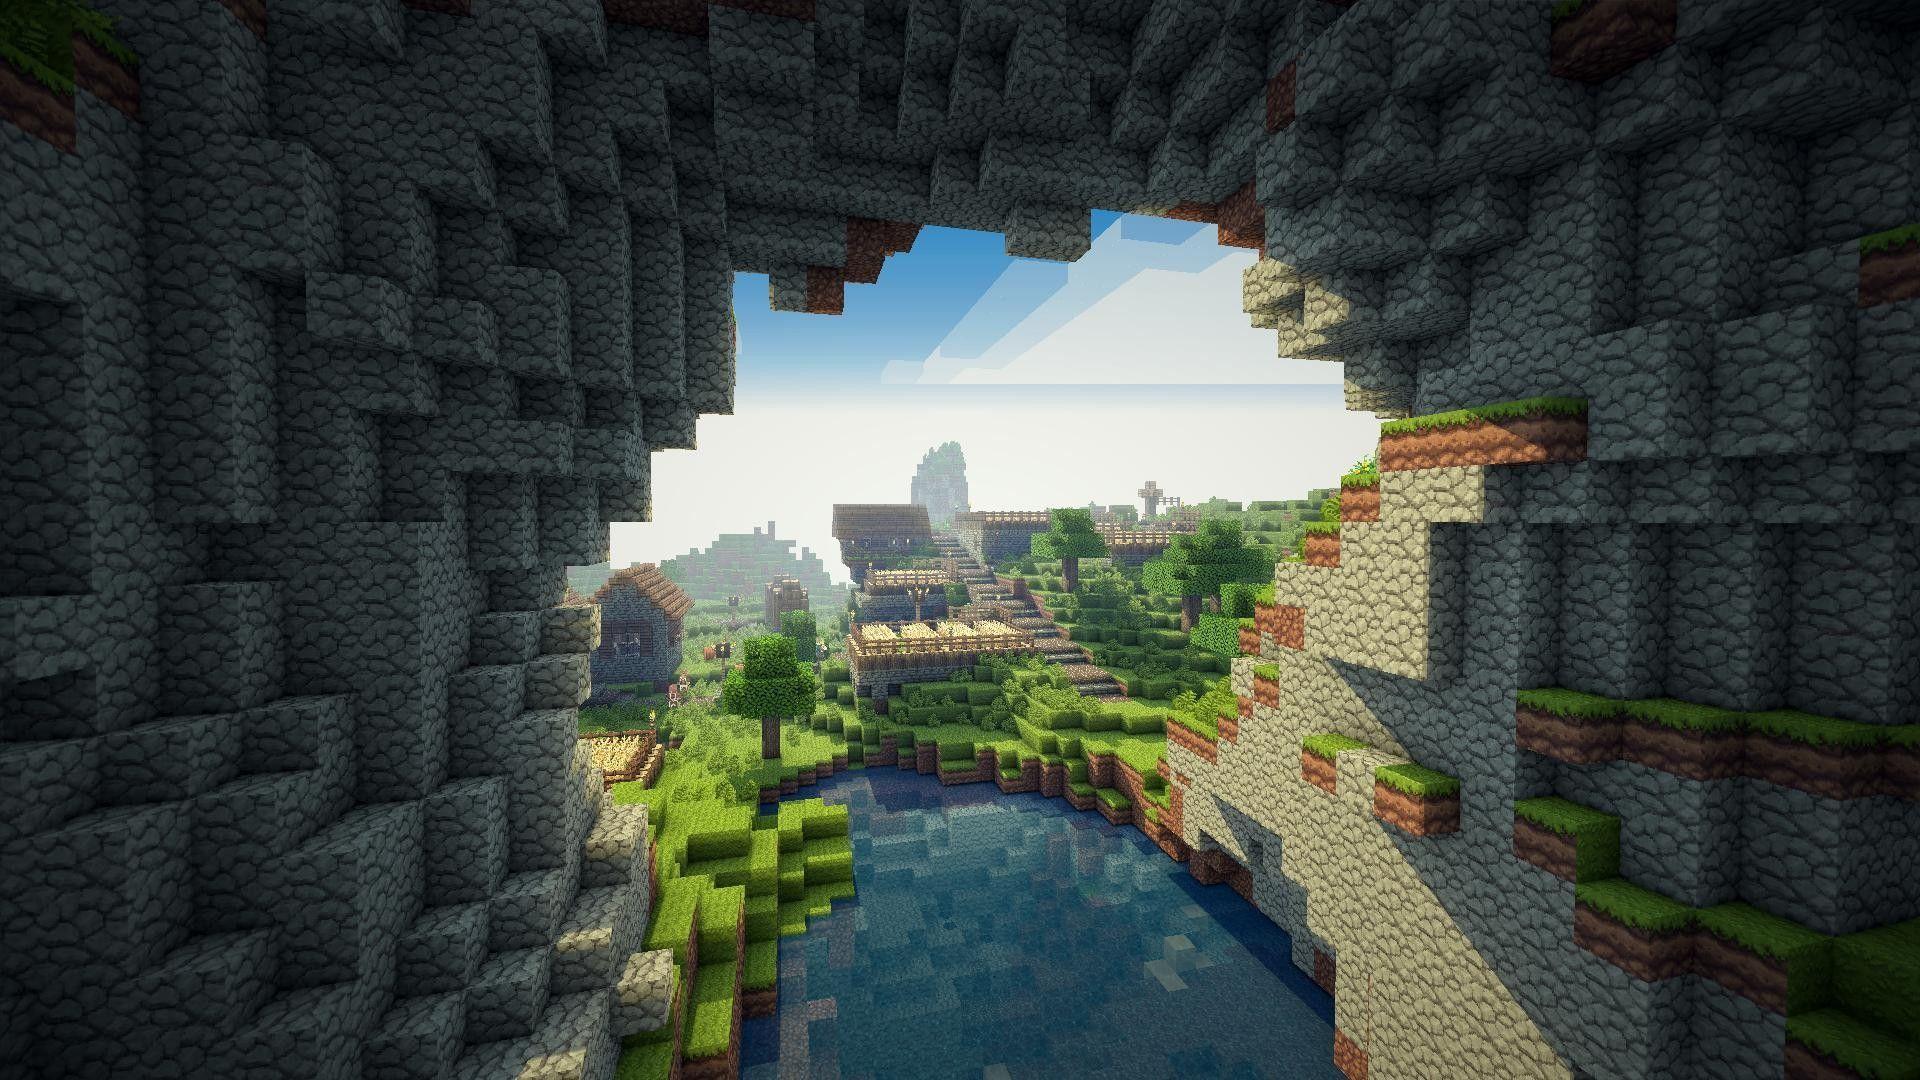 Minecraft Pocket Edition passes million in sales far more